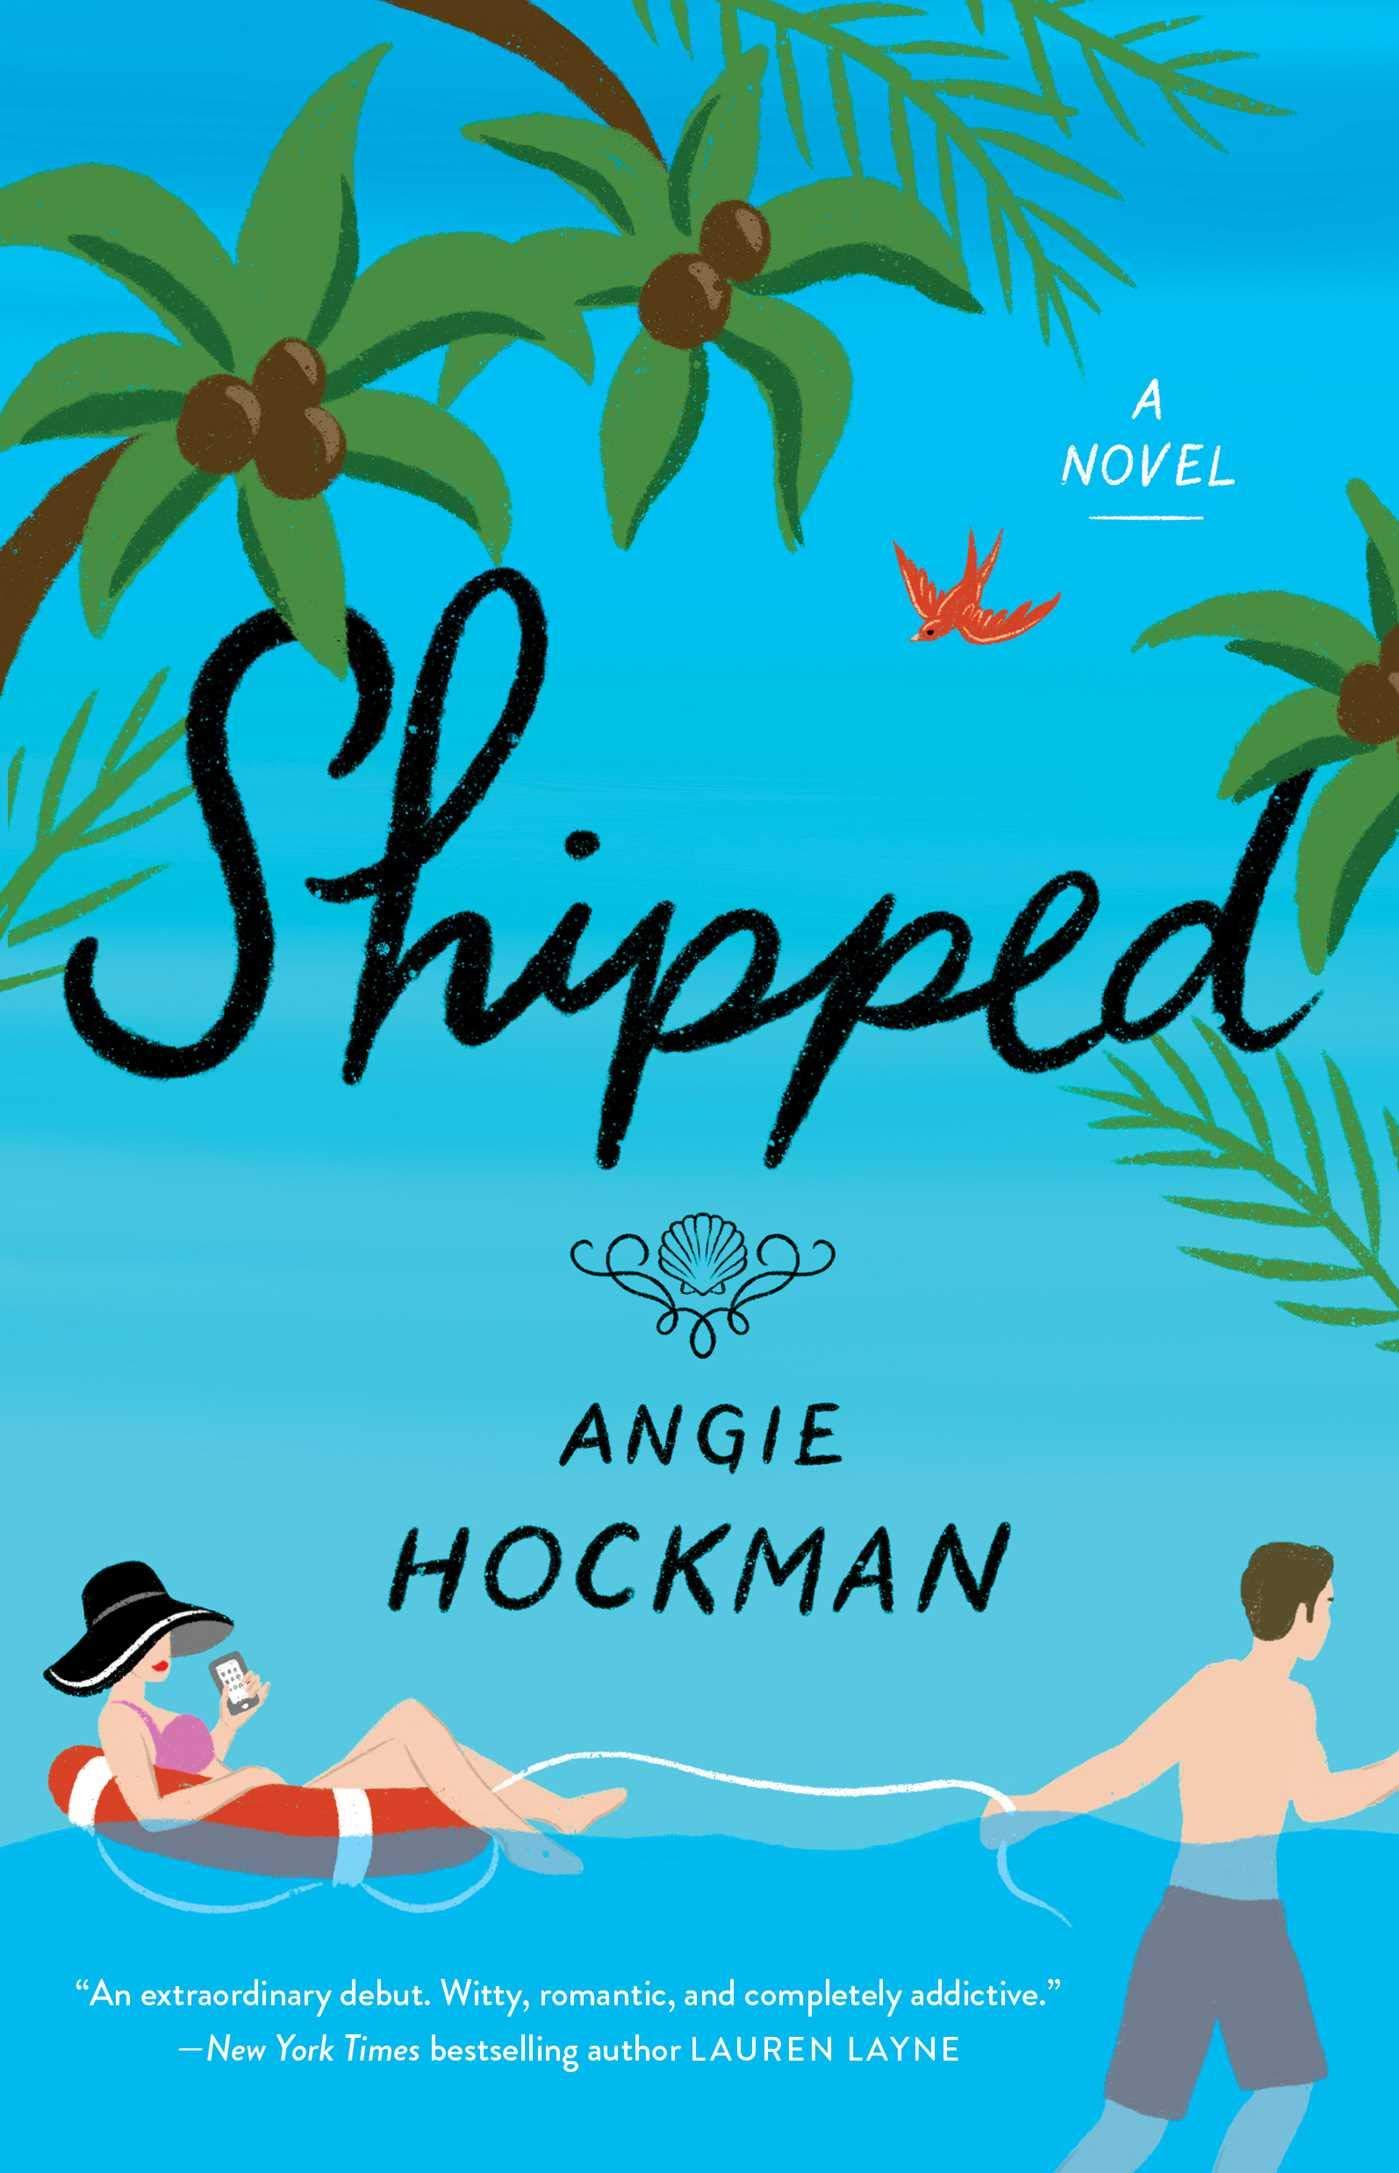 Shipped: Hockman, Angie: 9781982151591: Amazon.com: Books